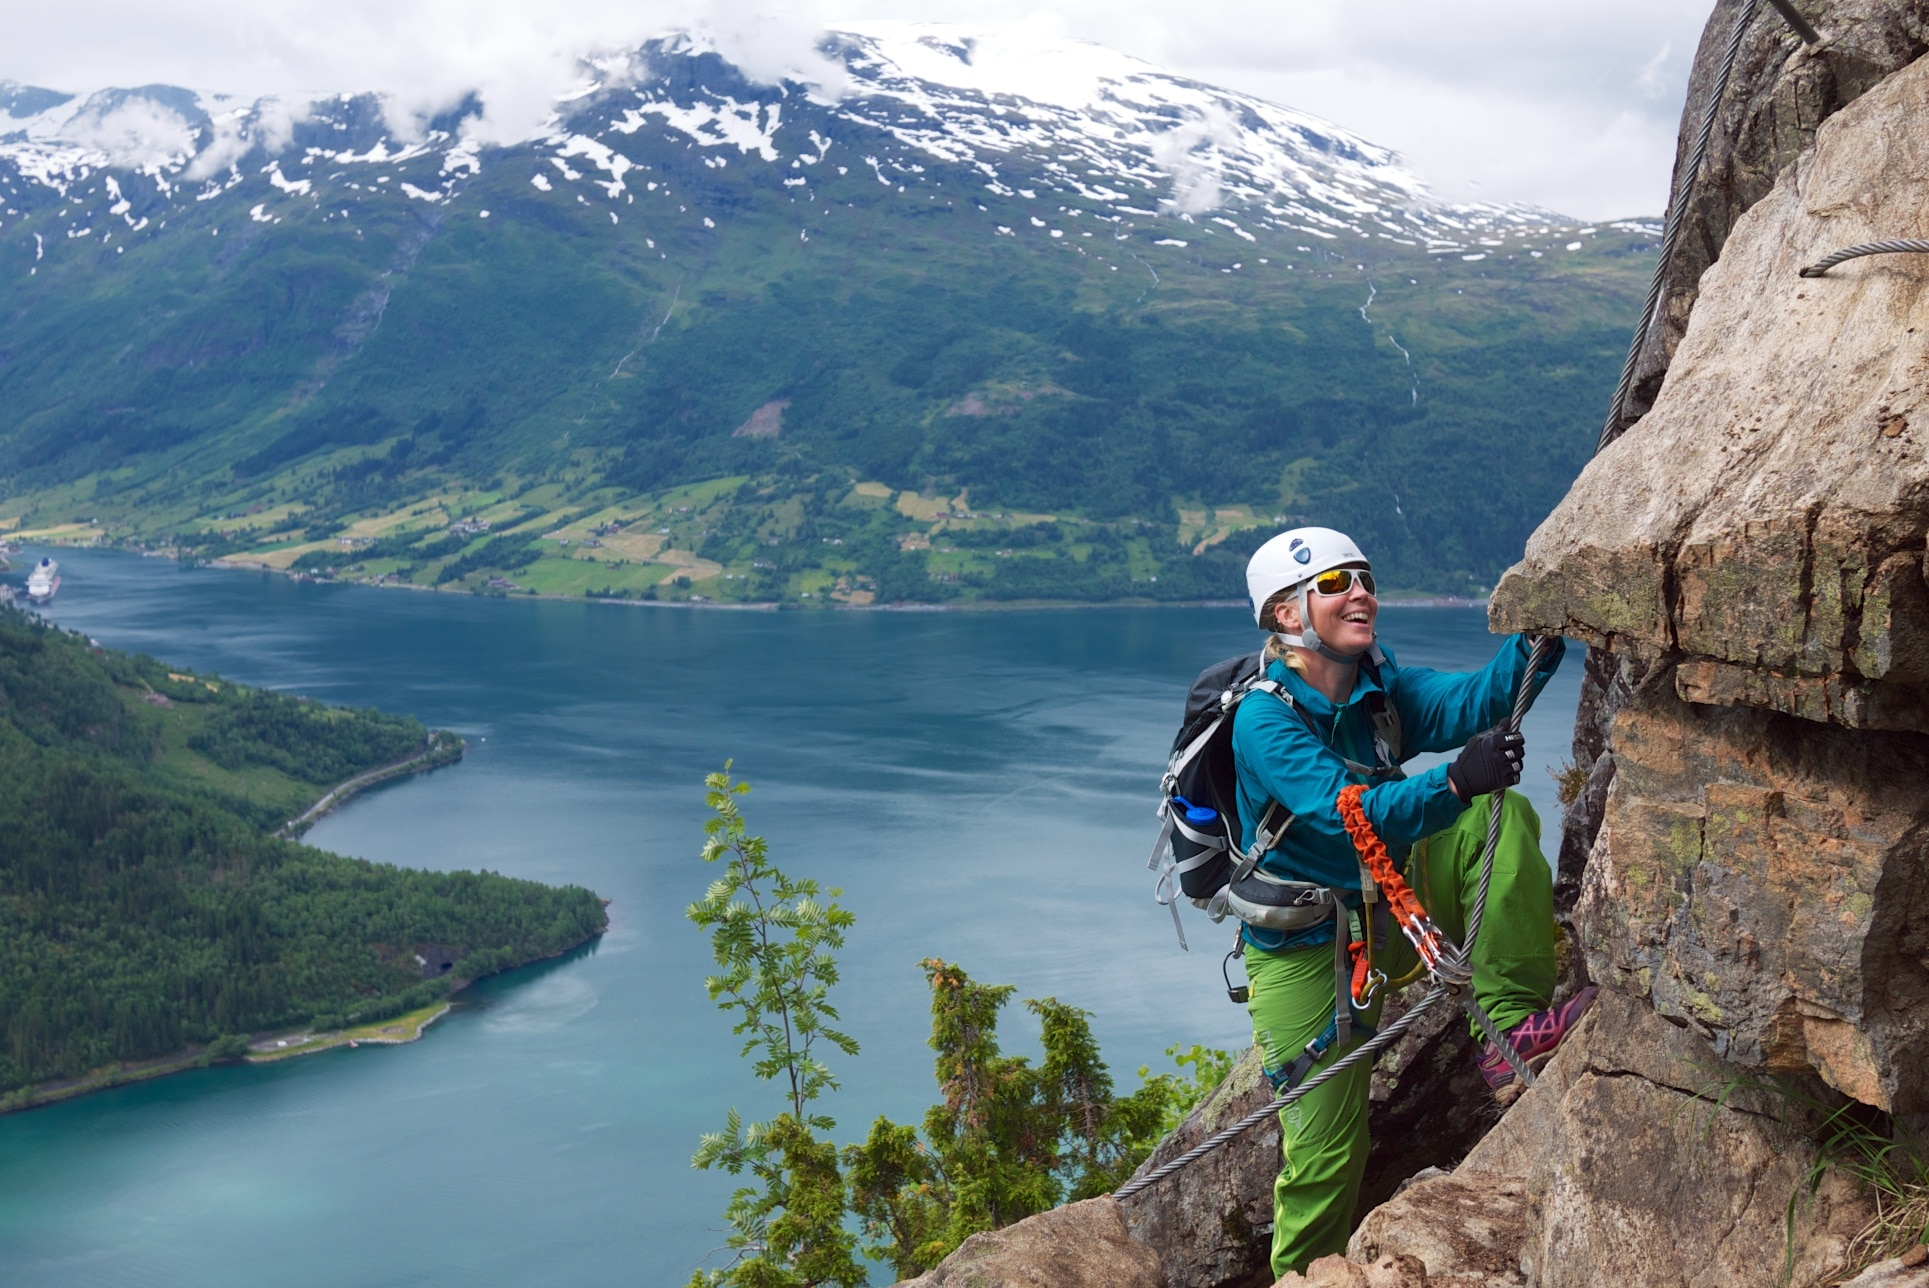 Klettersteig Via Ferrata : Klettersteige korsika via ferrata